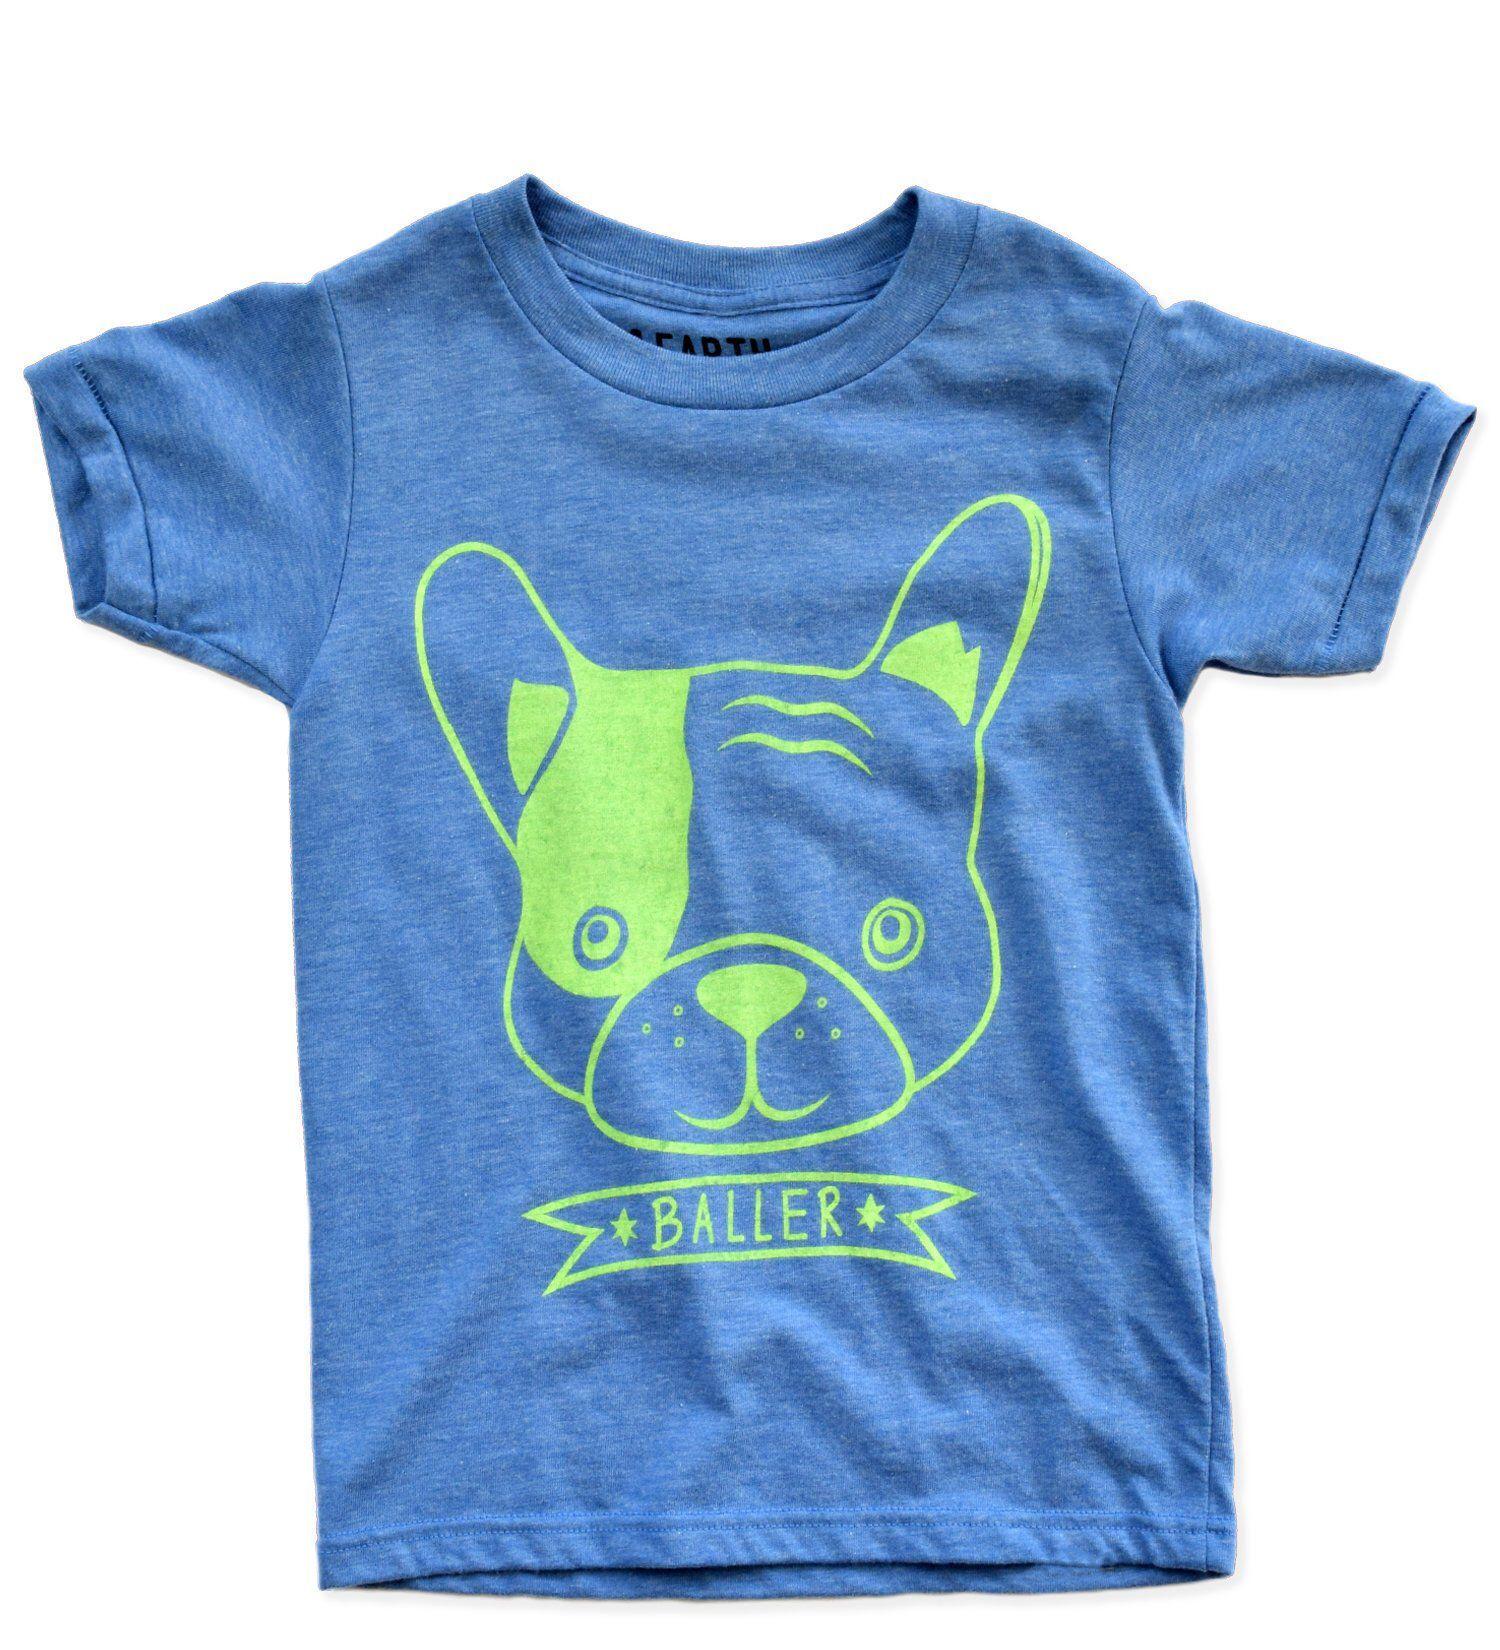 COTDREN Cute French Bulldog Boys Cotton Long Sleeve Tshirt